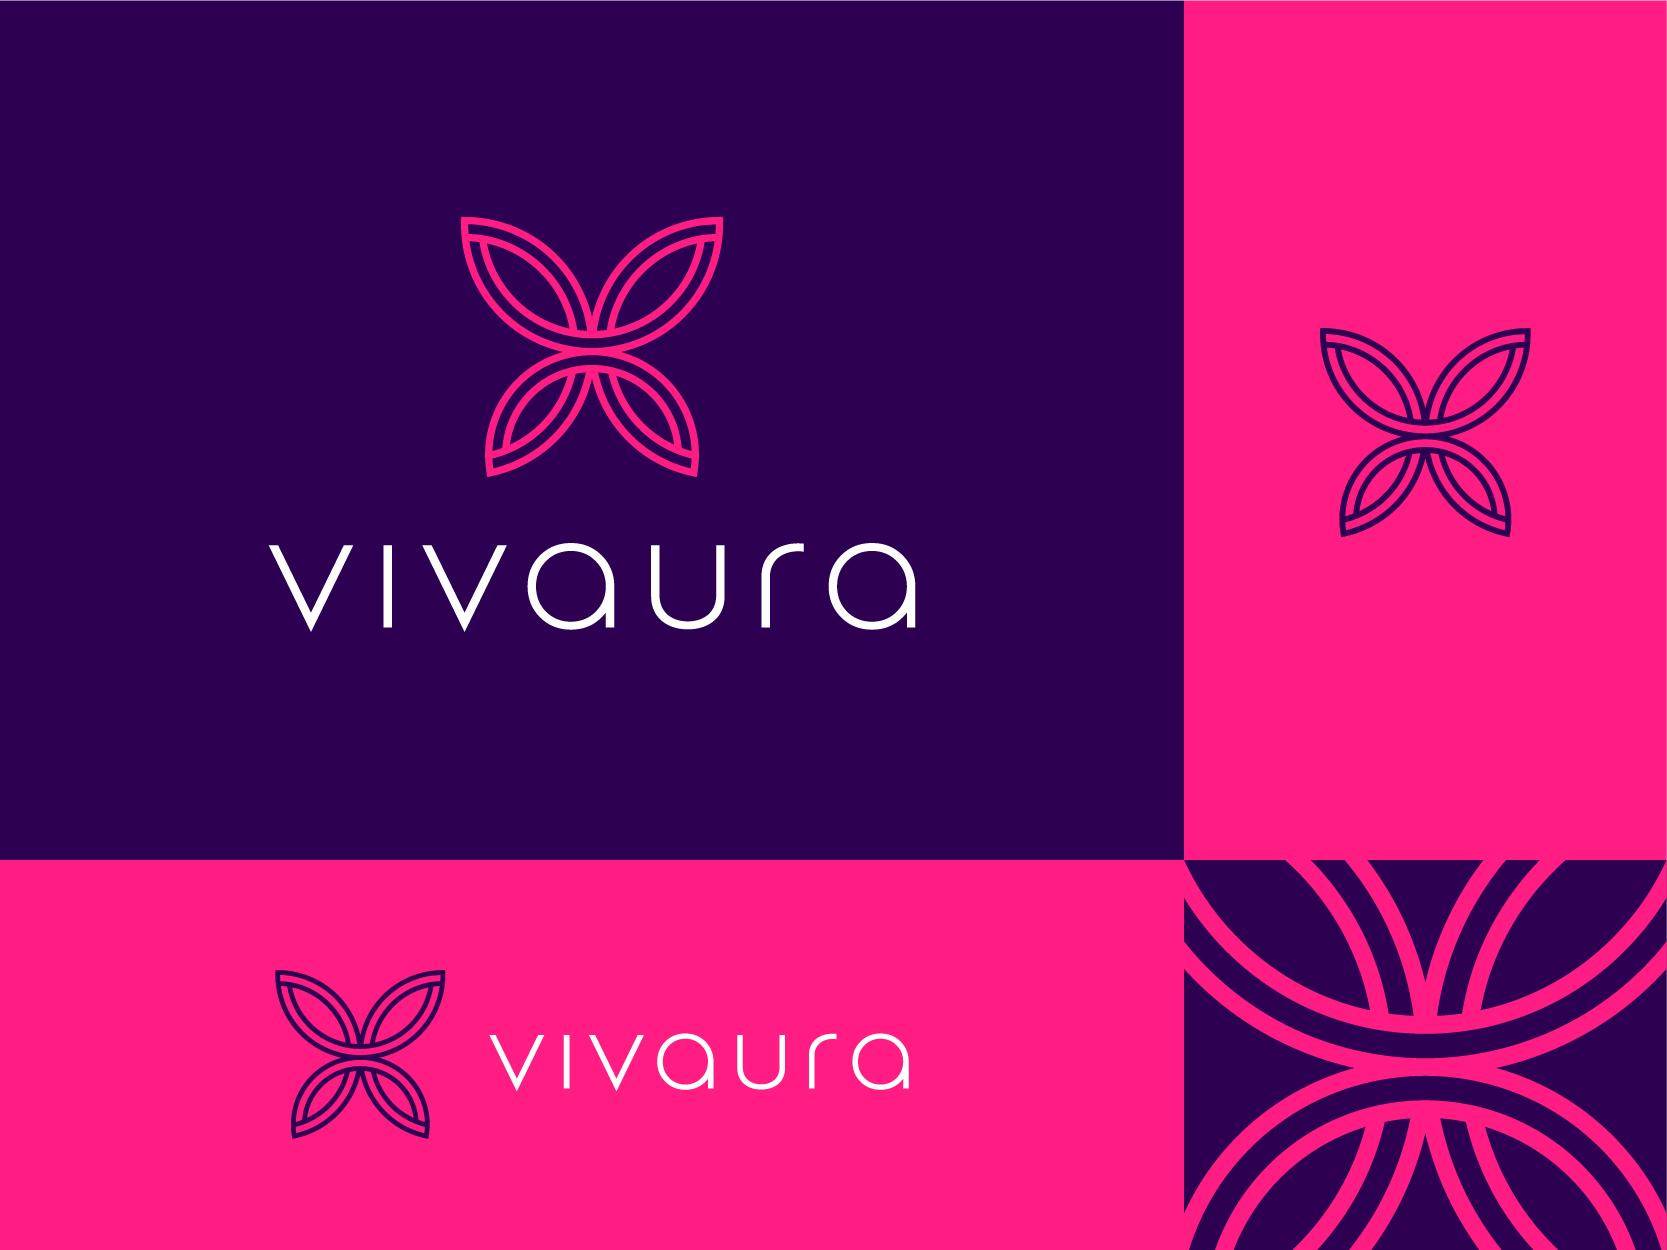 Vivaura 07